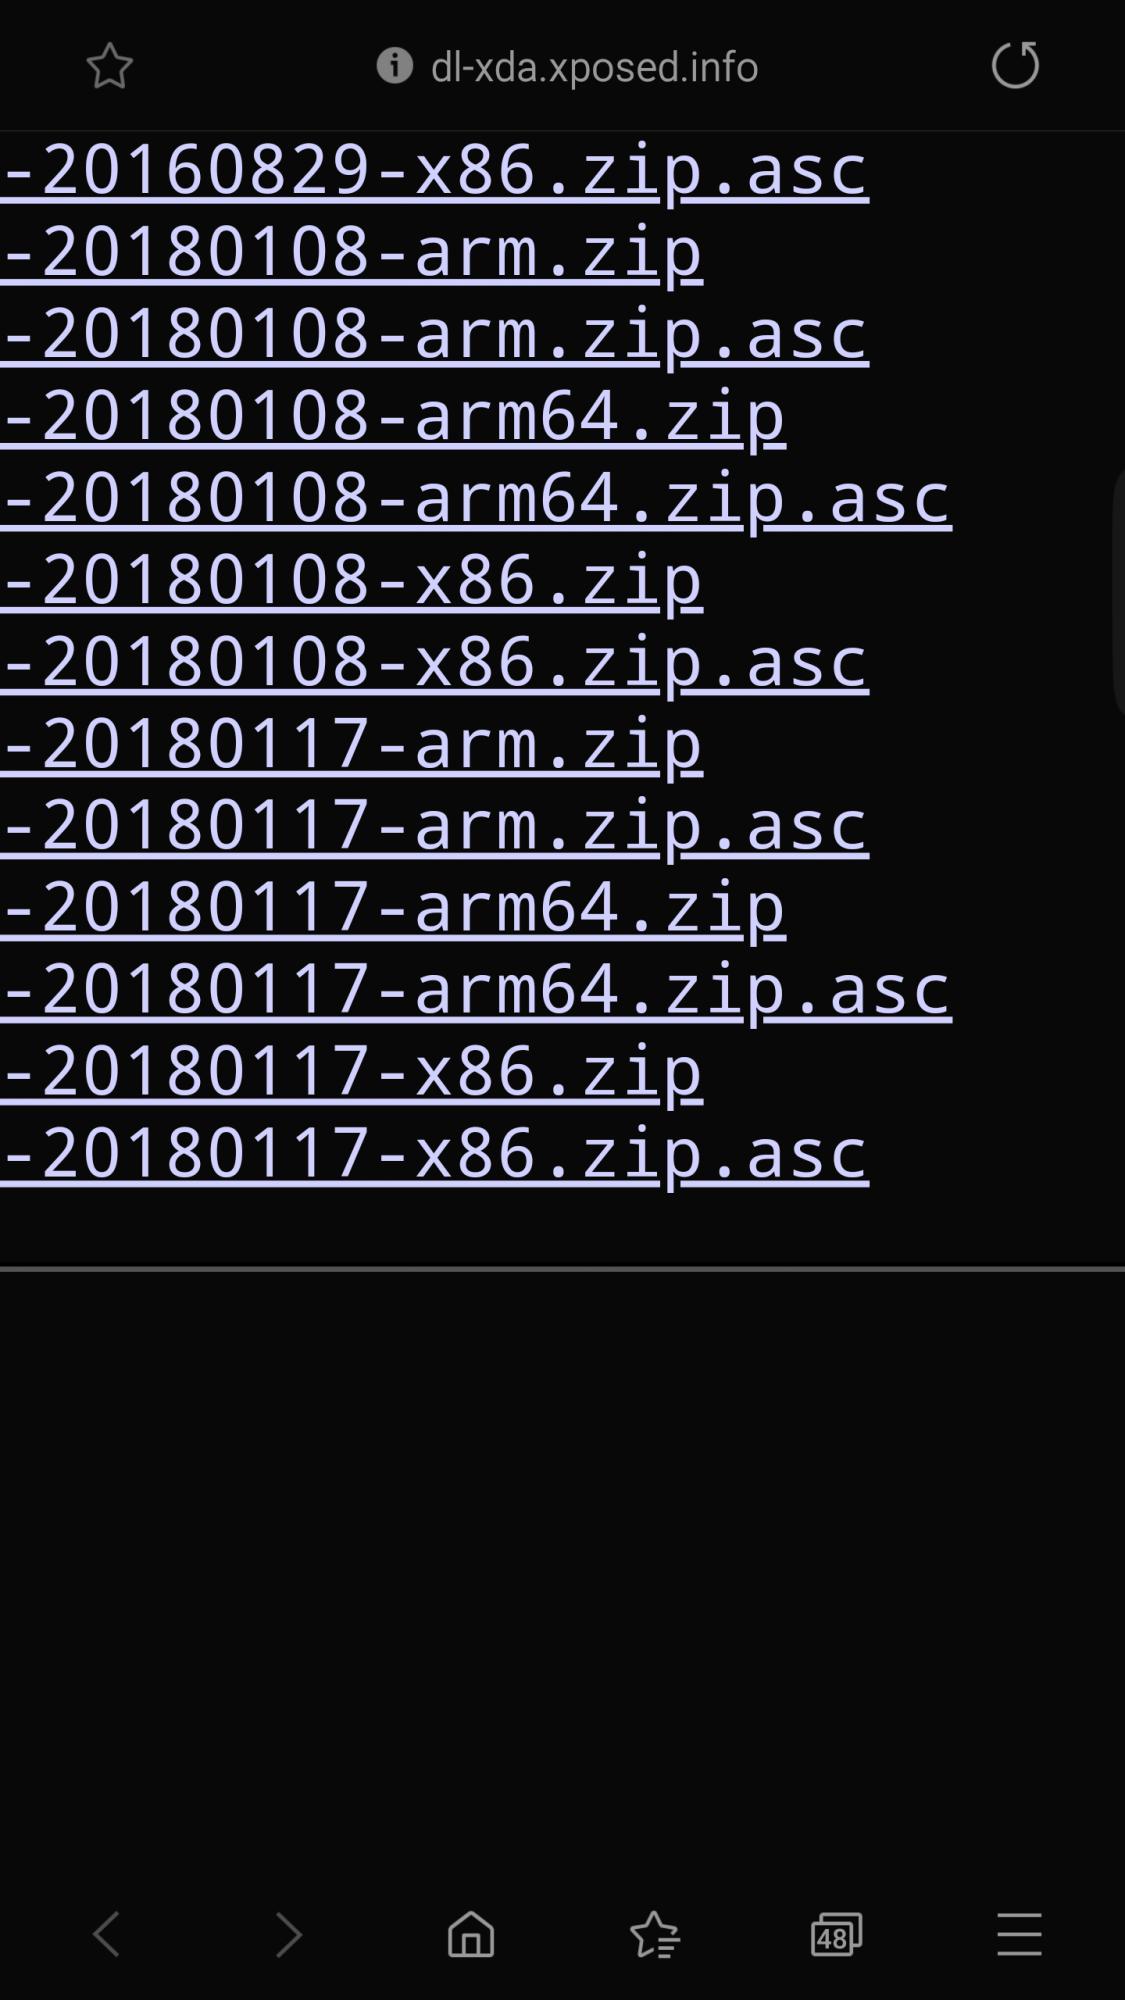 Screenshot_2020-01-14-01-21-49.png